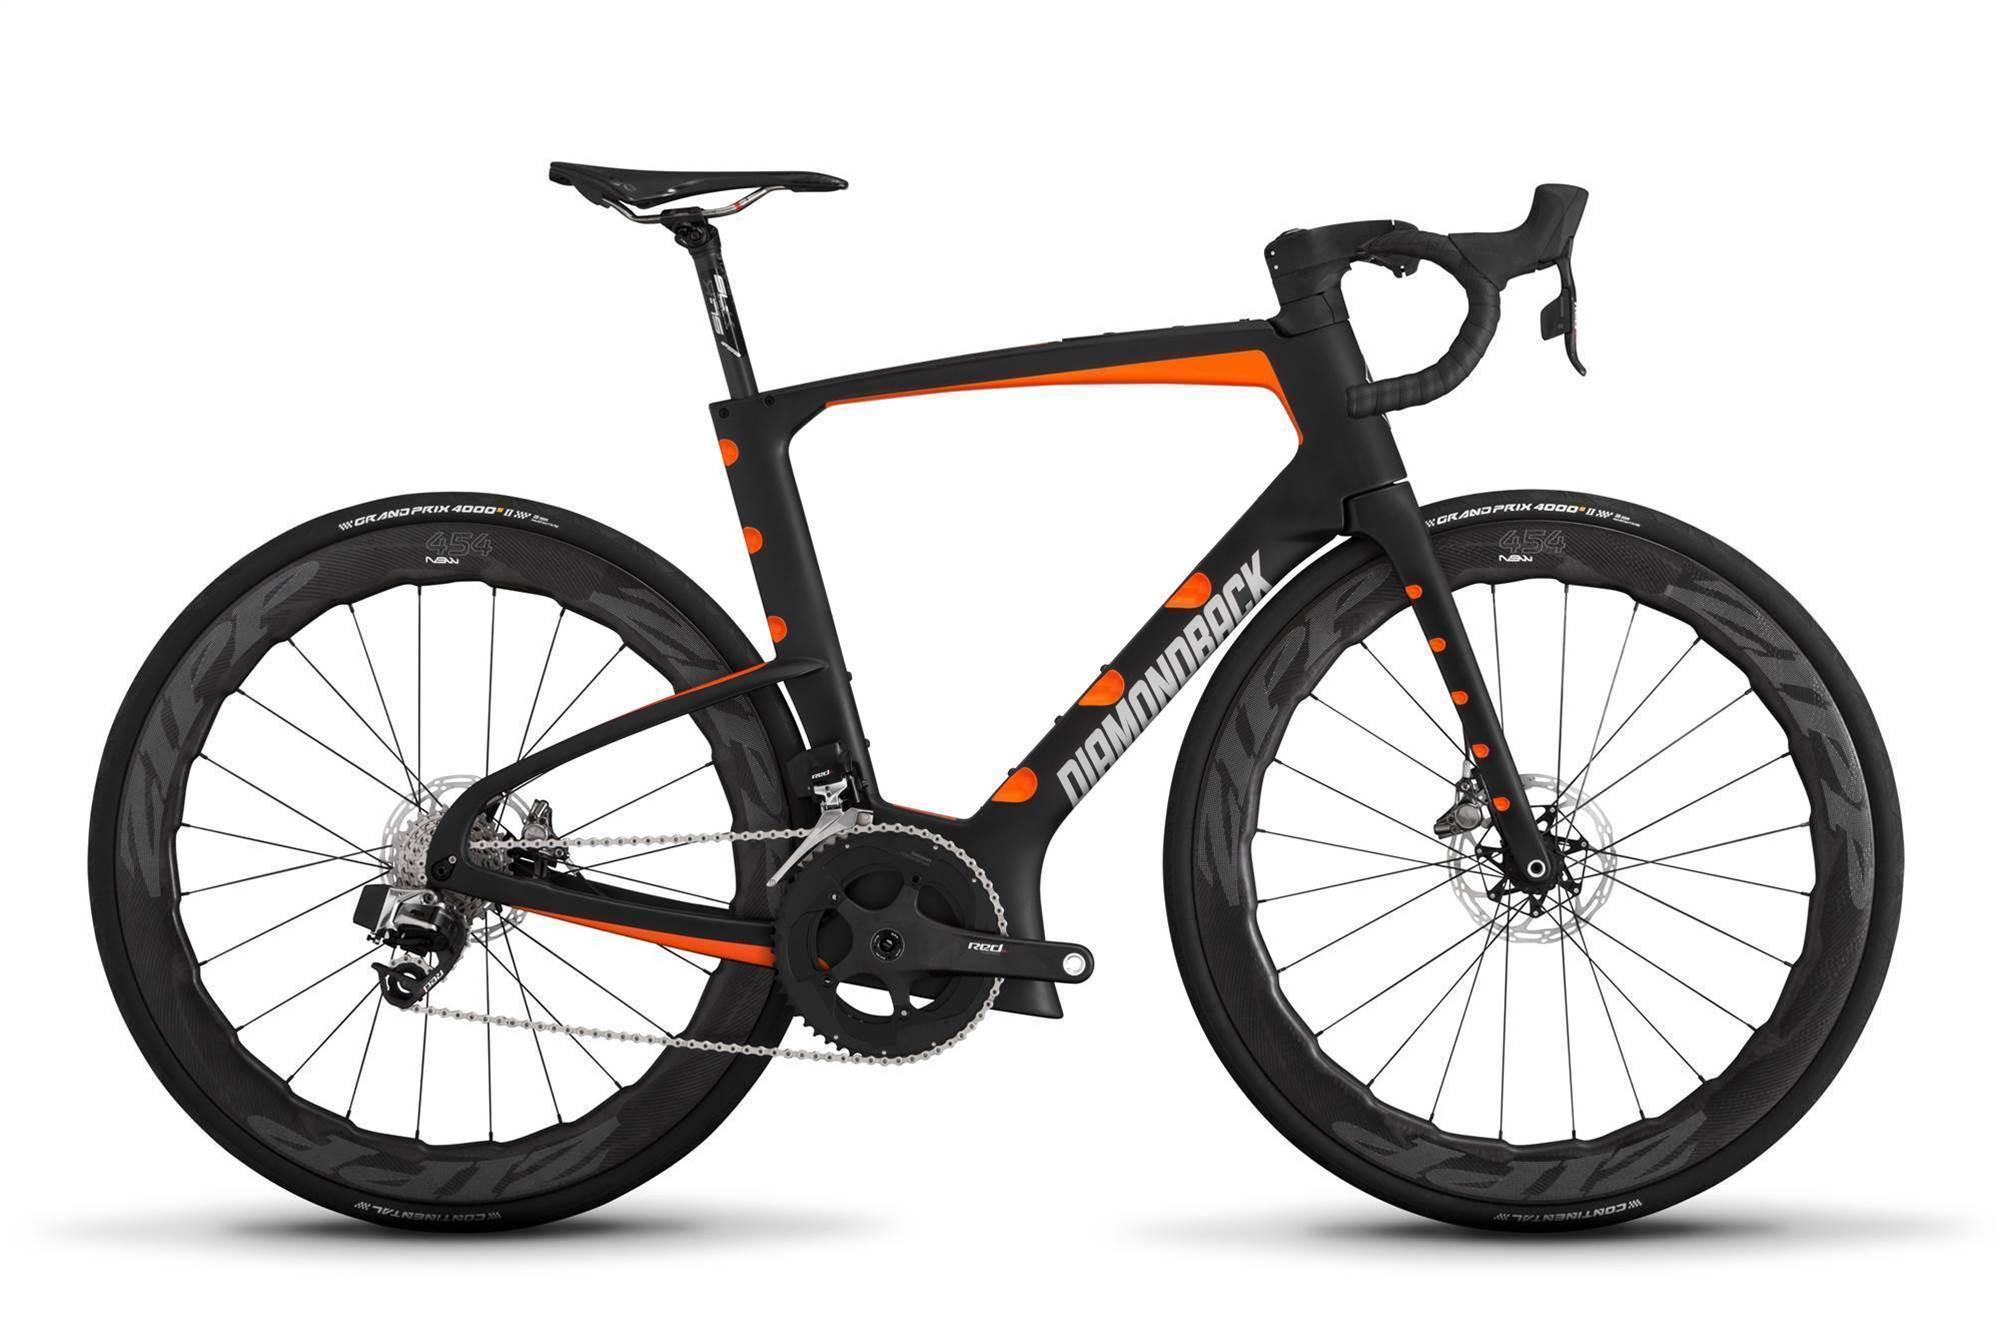 FIRST LOOK: Diamondback's new IO Aero road bike